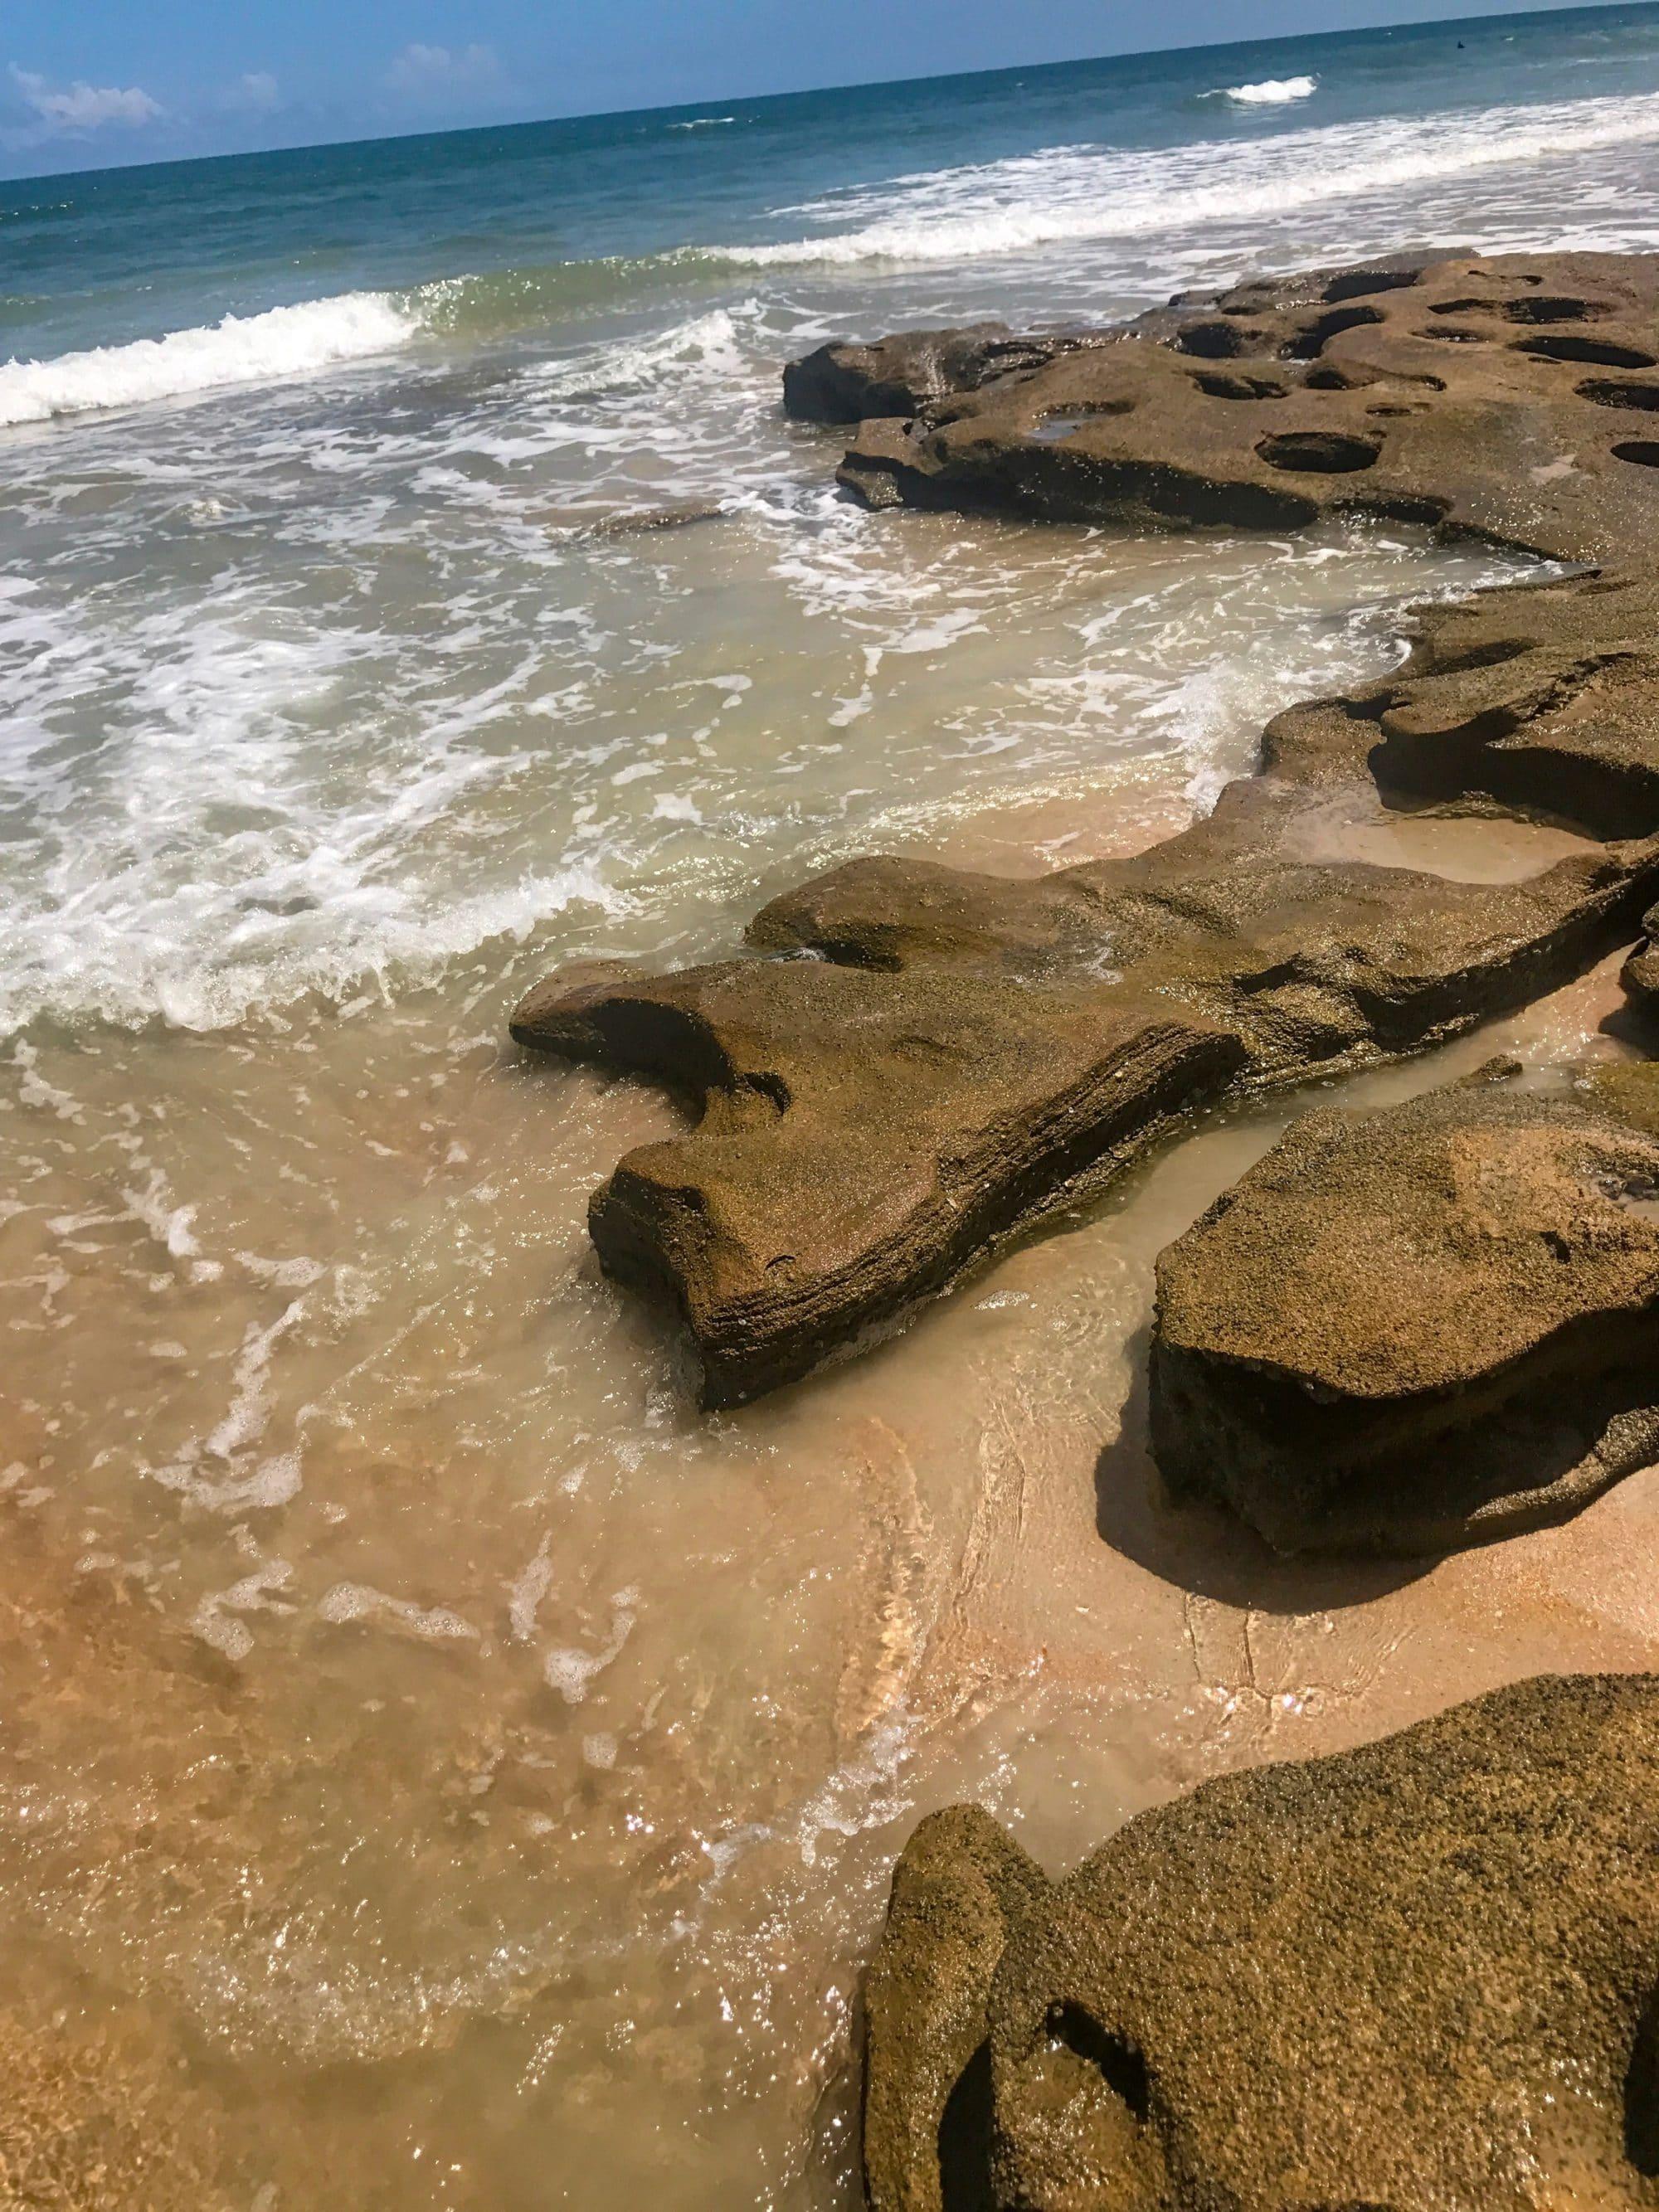 Ormond beach photography of Washington oaks state park near marineland. Coquina rock formations on the east coast of Florida.